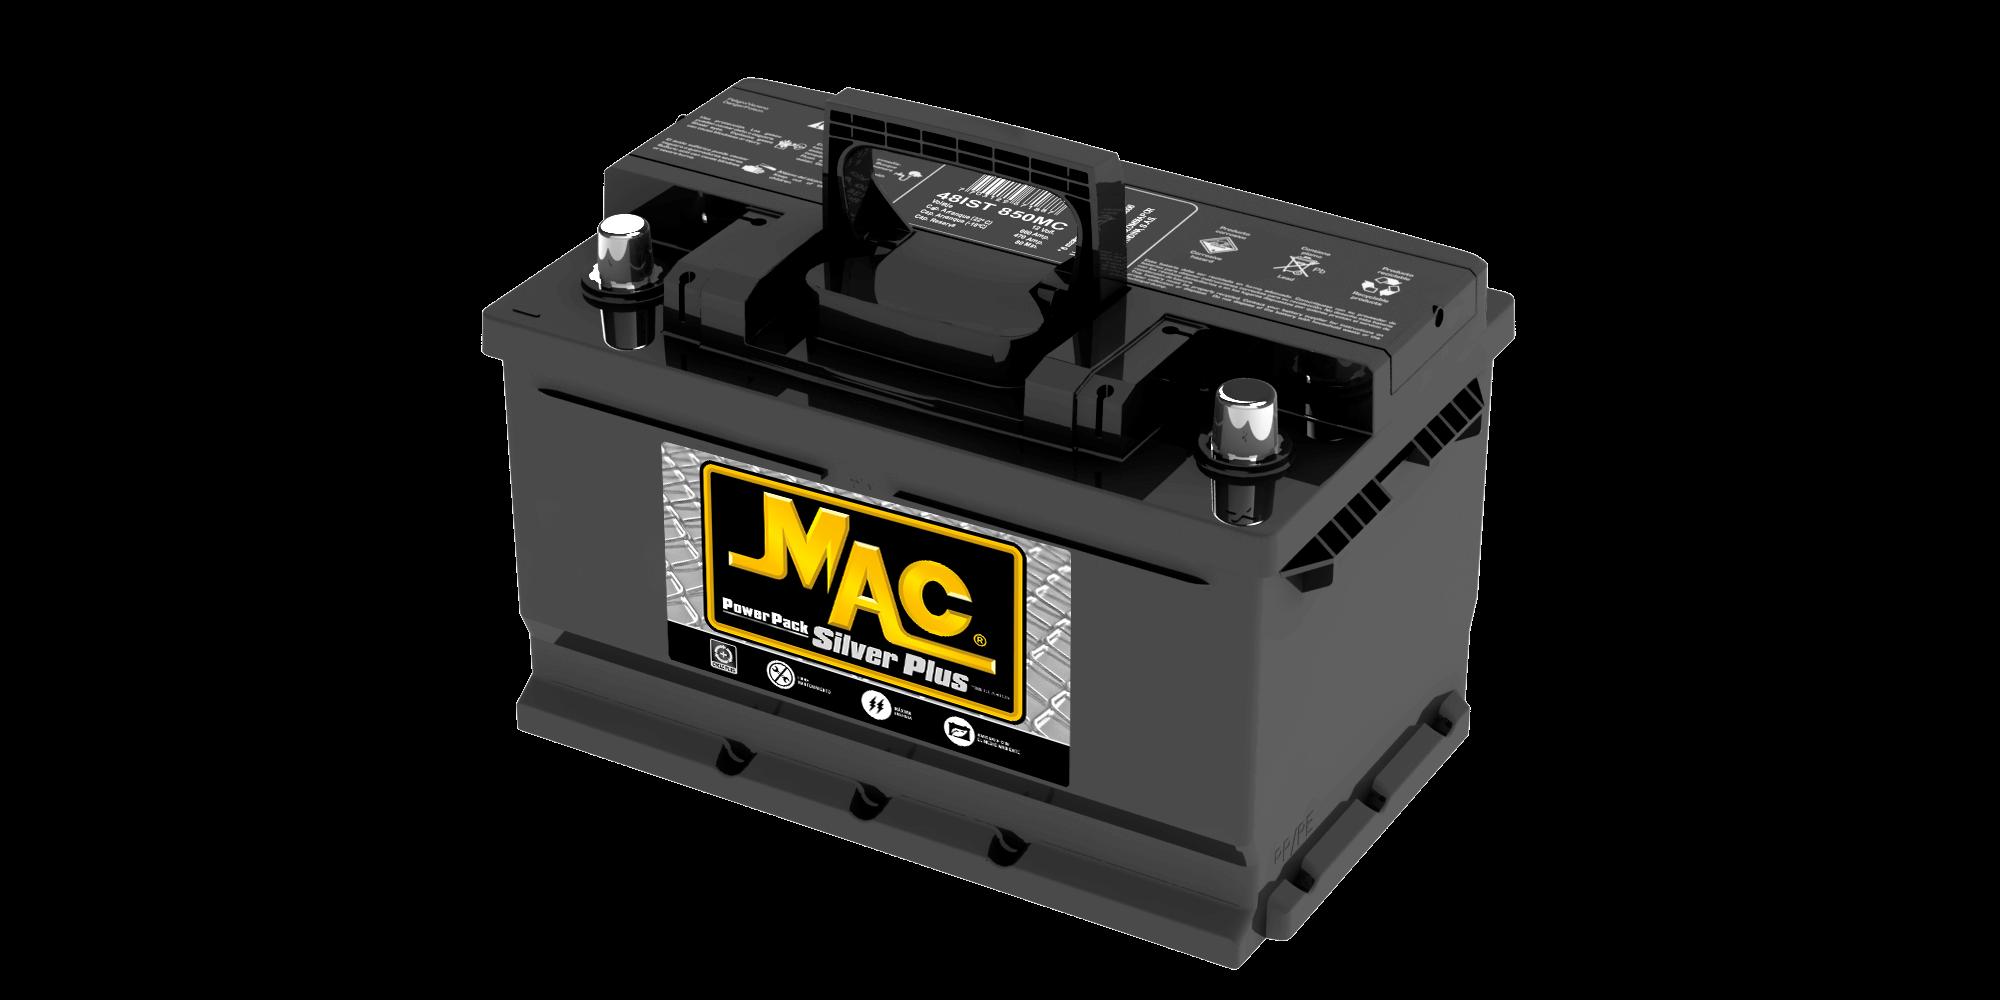 Mac Silver Plus 48IST950MC